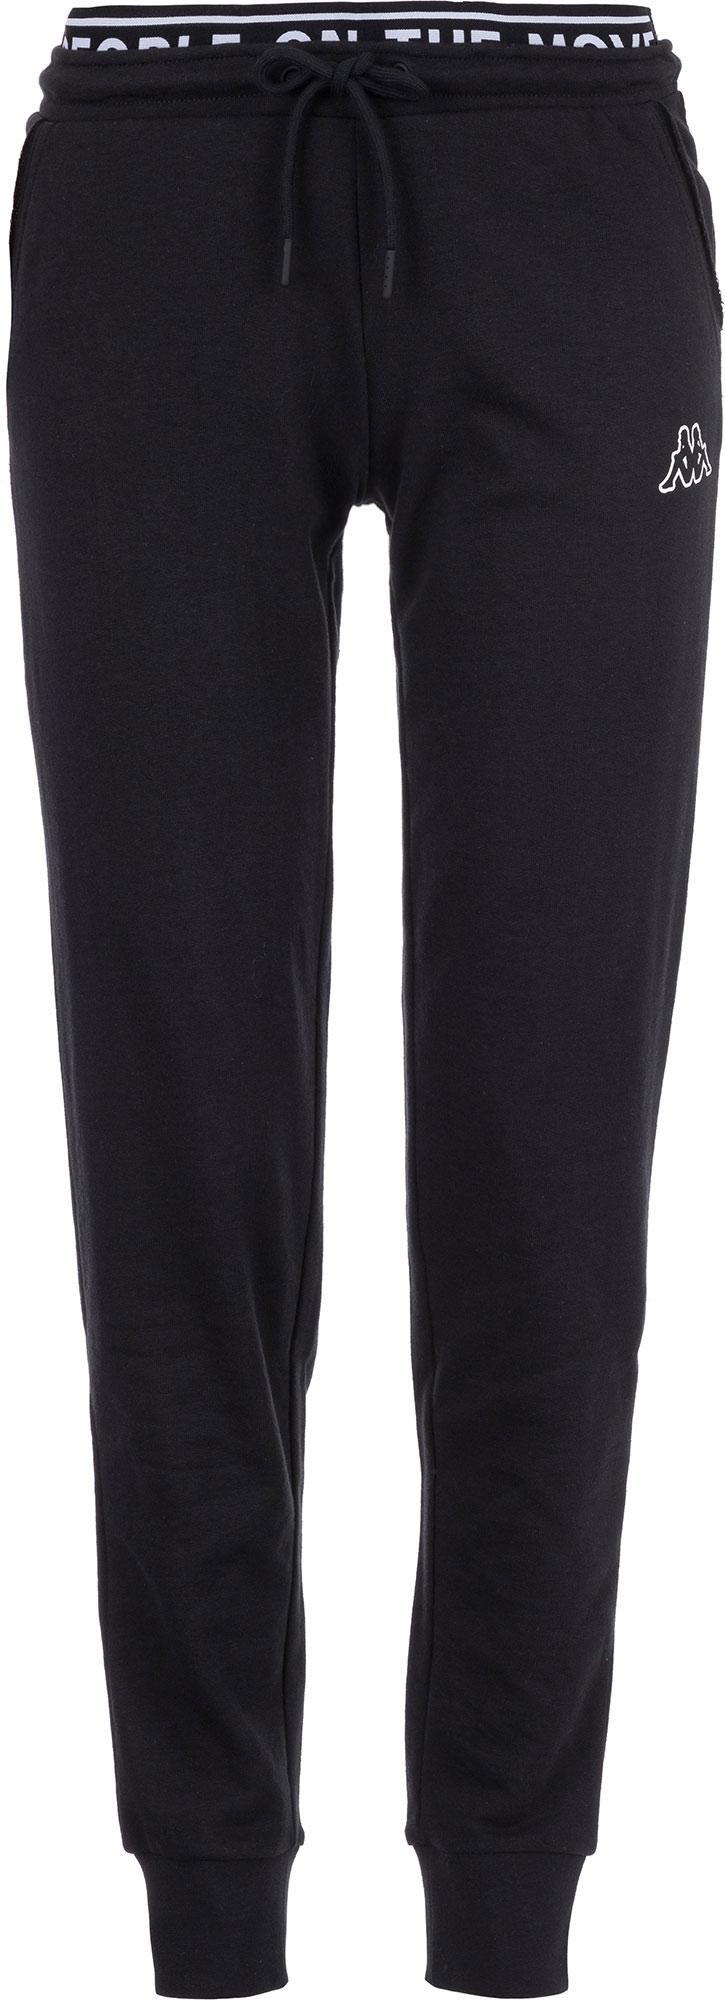 Kappa Брюки женские Kappa, размер 50 брюки женские kappa цвет милитари 3032260 5o размер xs 42